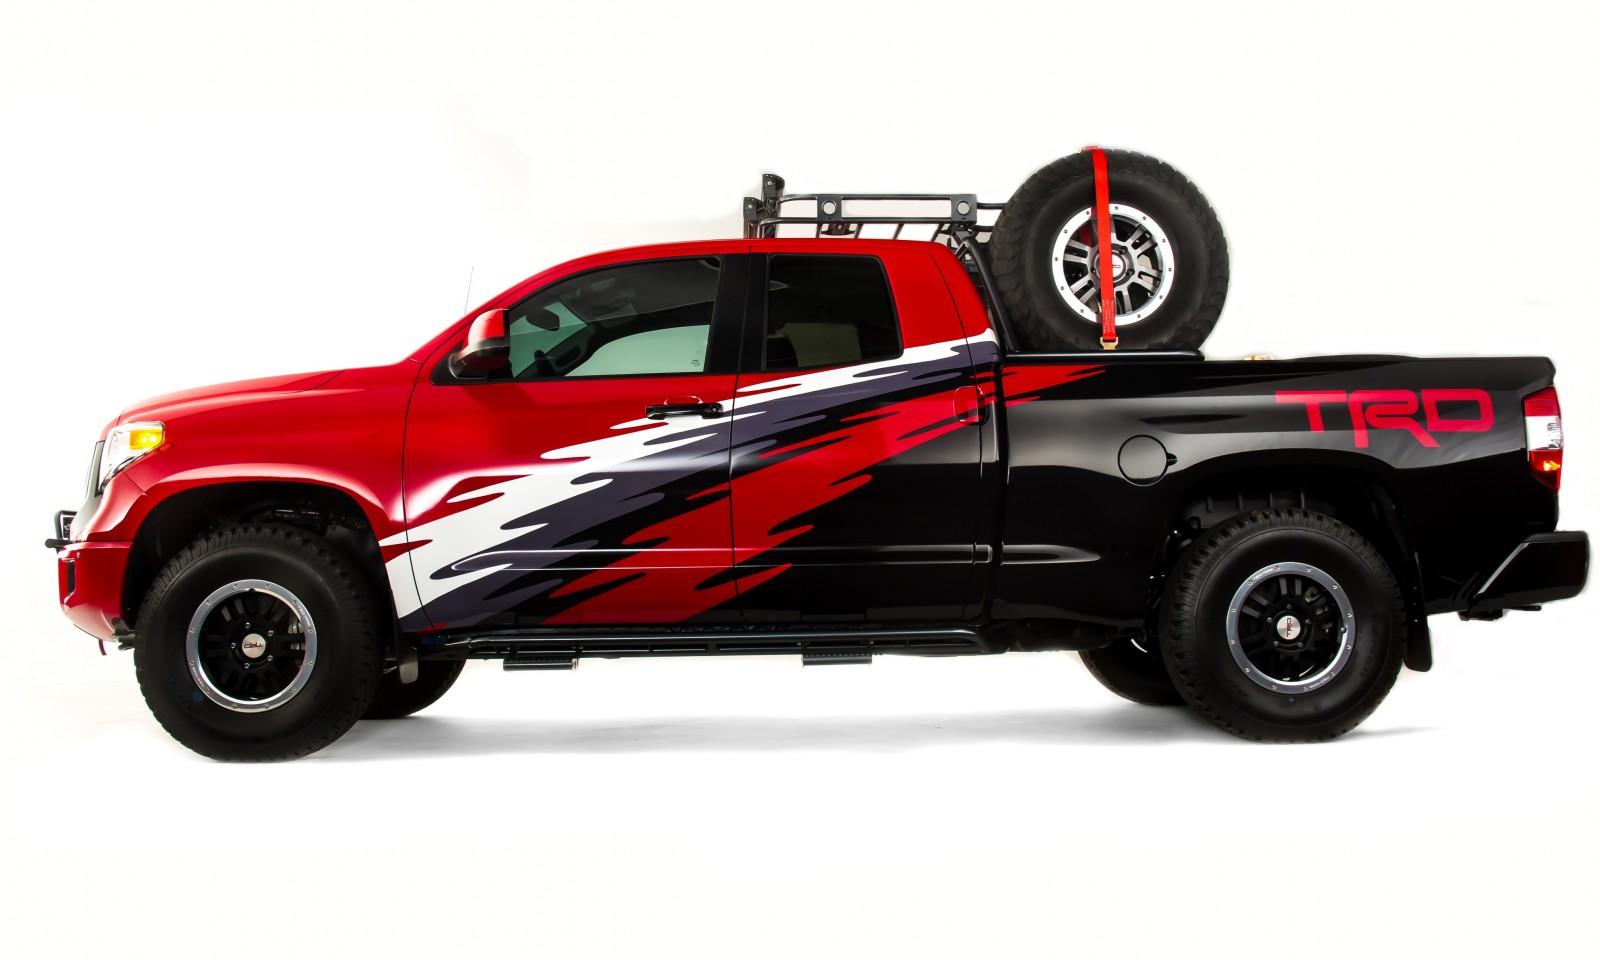 2016 TOYOTA TUNDRA TRD Pro Trophy Truck Best in Baja